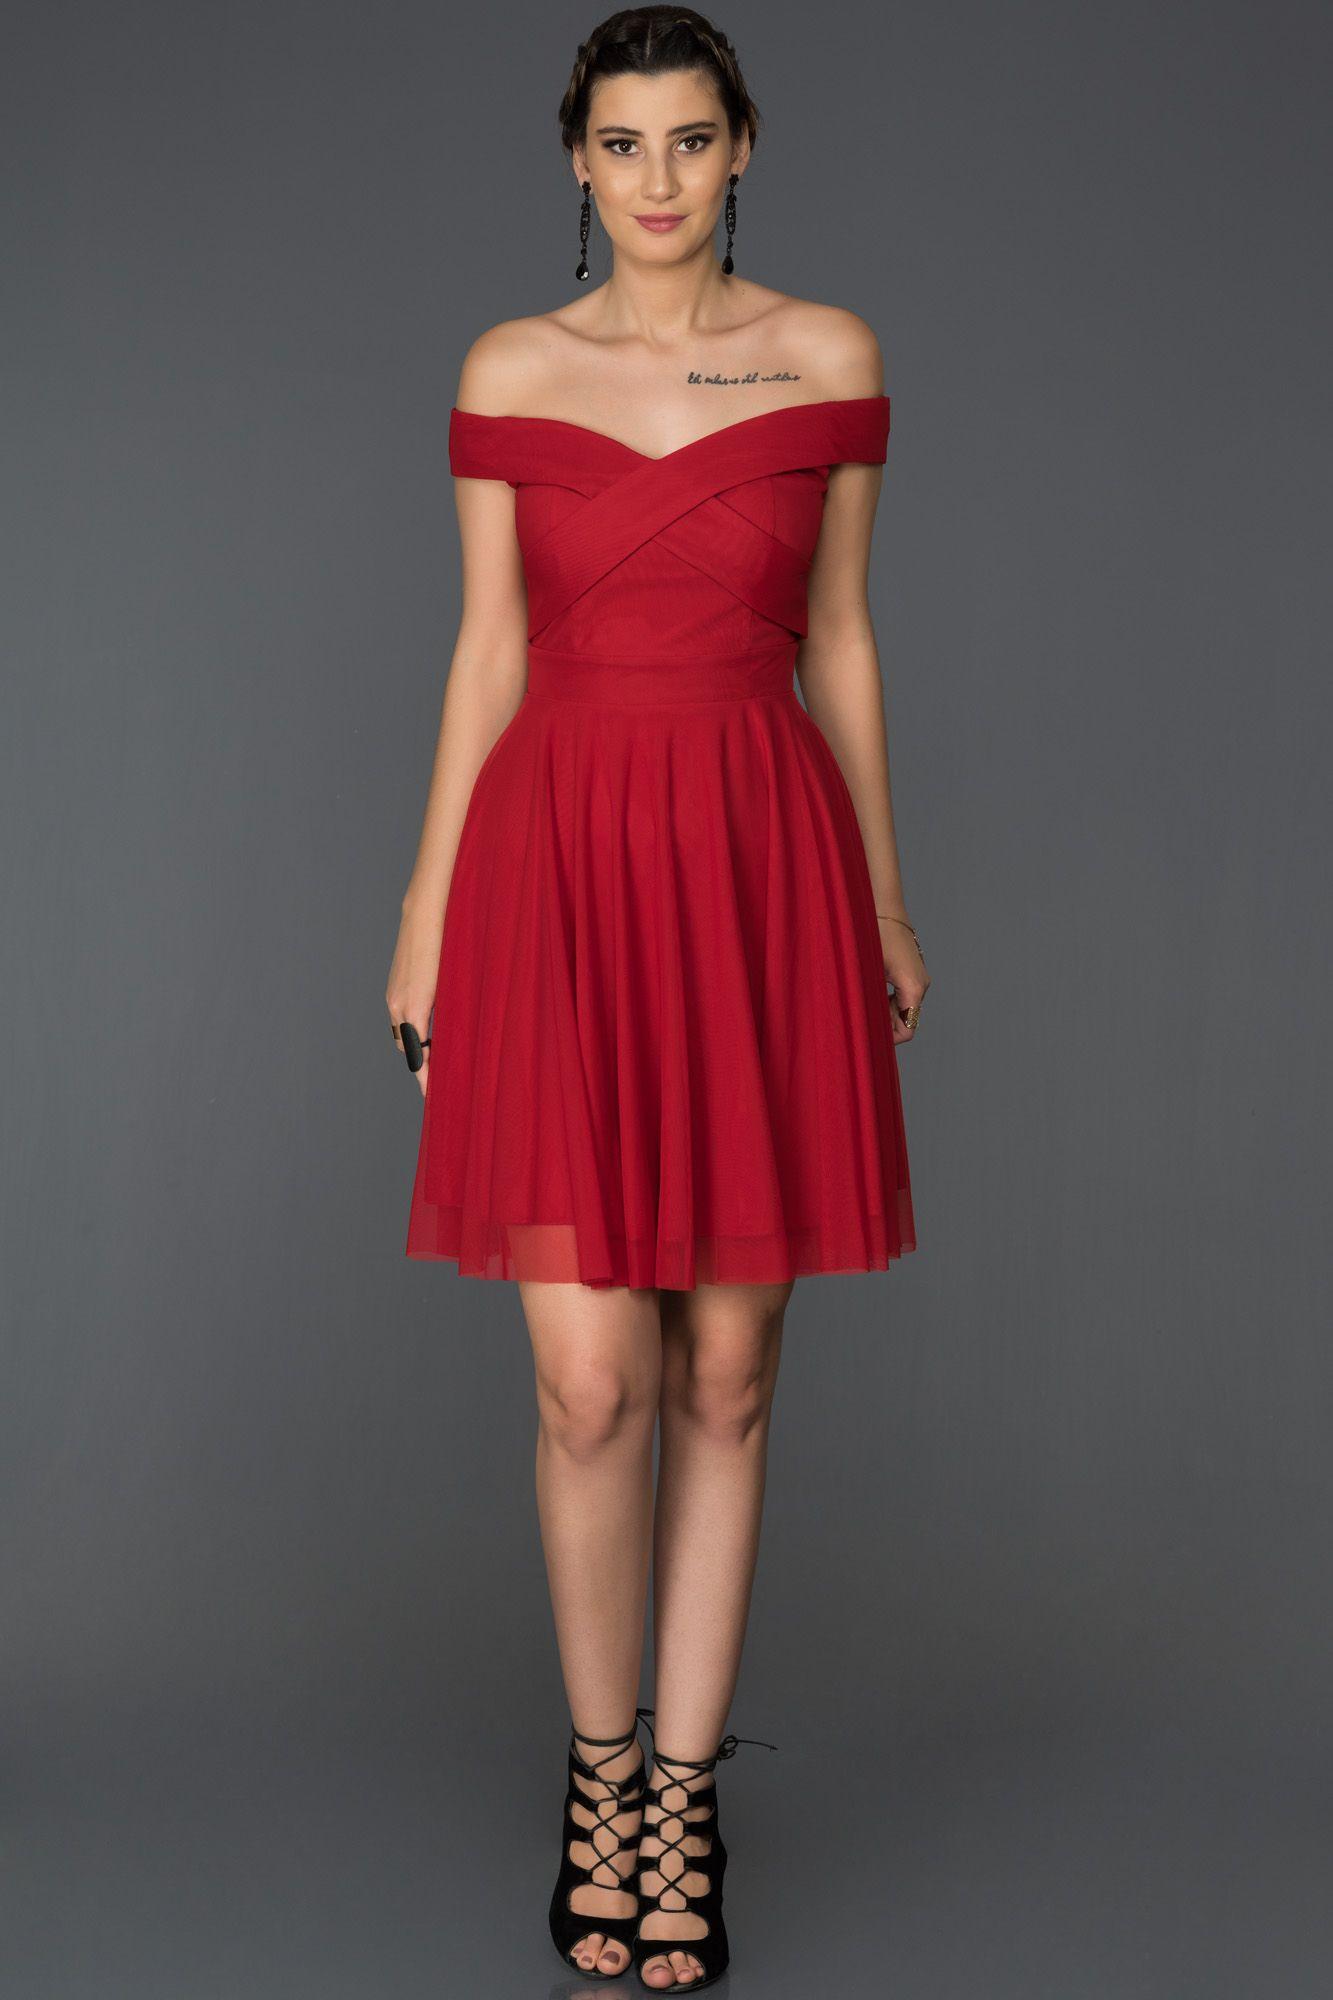 Kirmizi Kayik Yaka Tullu Elbise Abk008 The Dress Elbise Elbise Modelleri